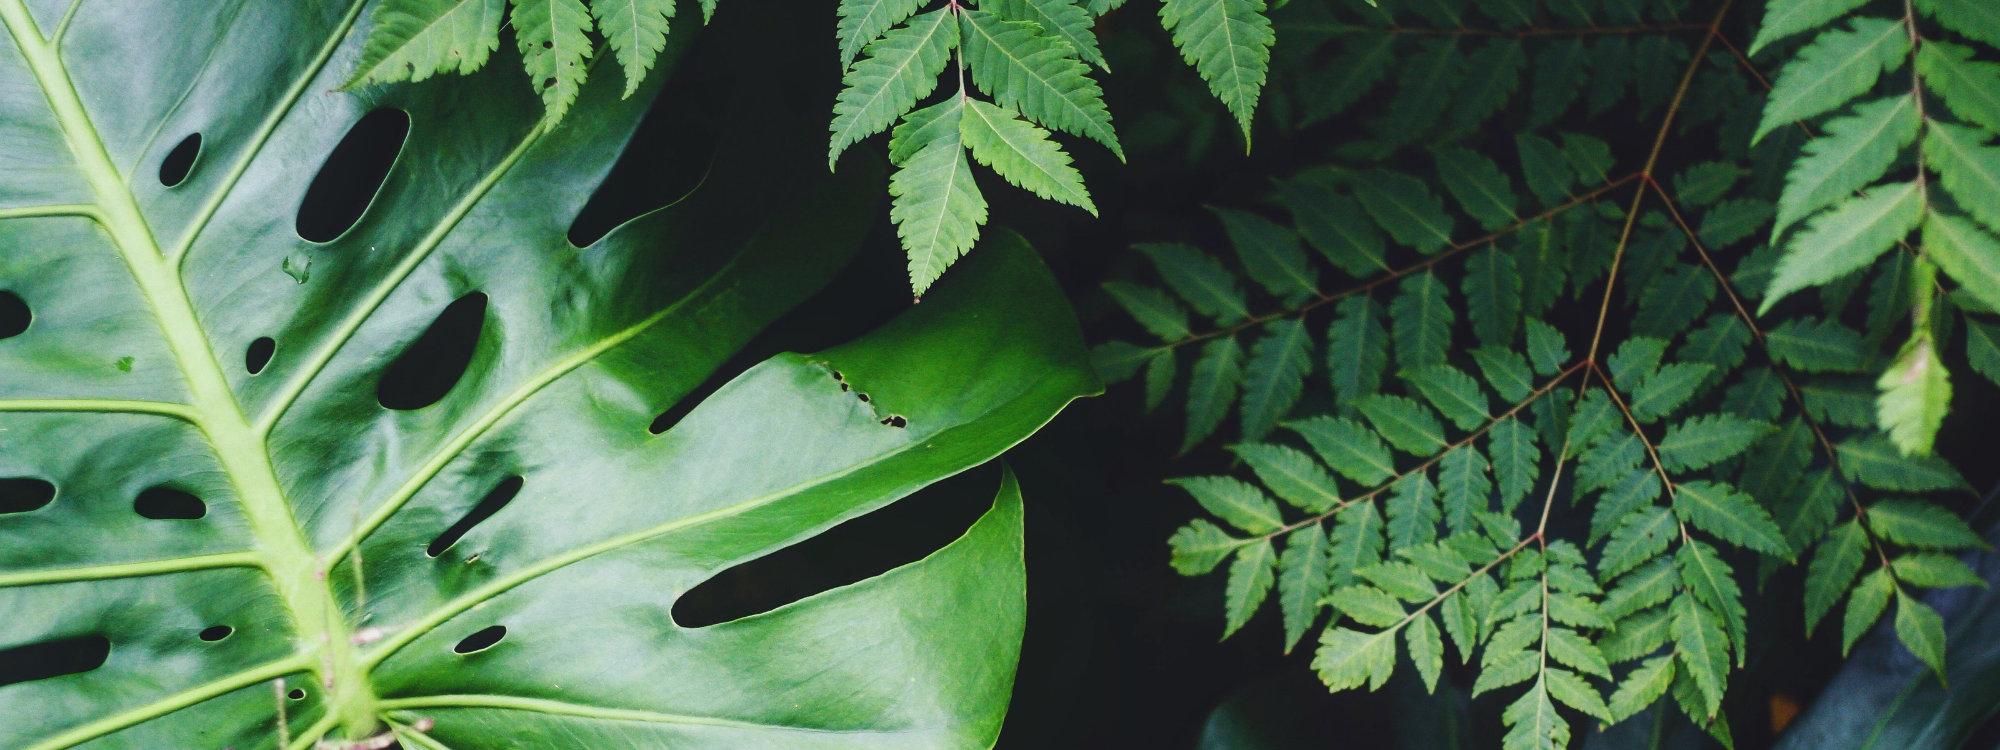 Europe's largest range of indoor and outdoor plants